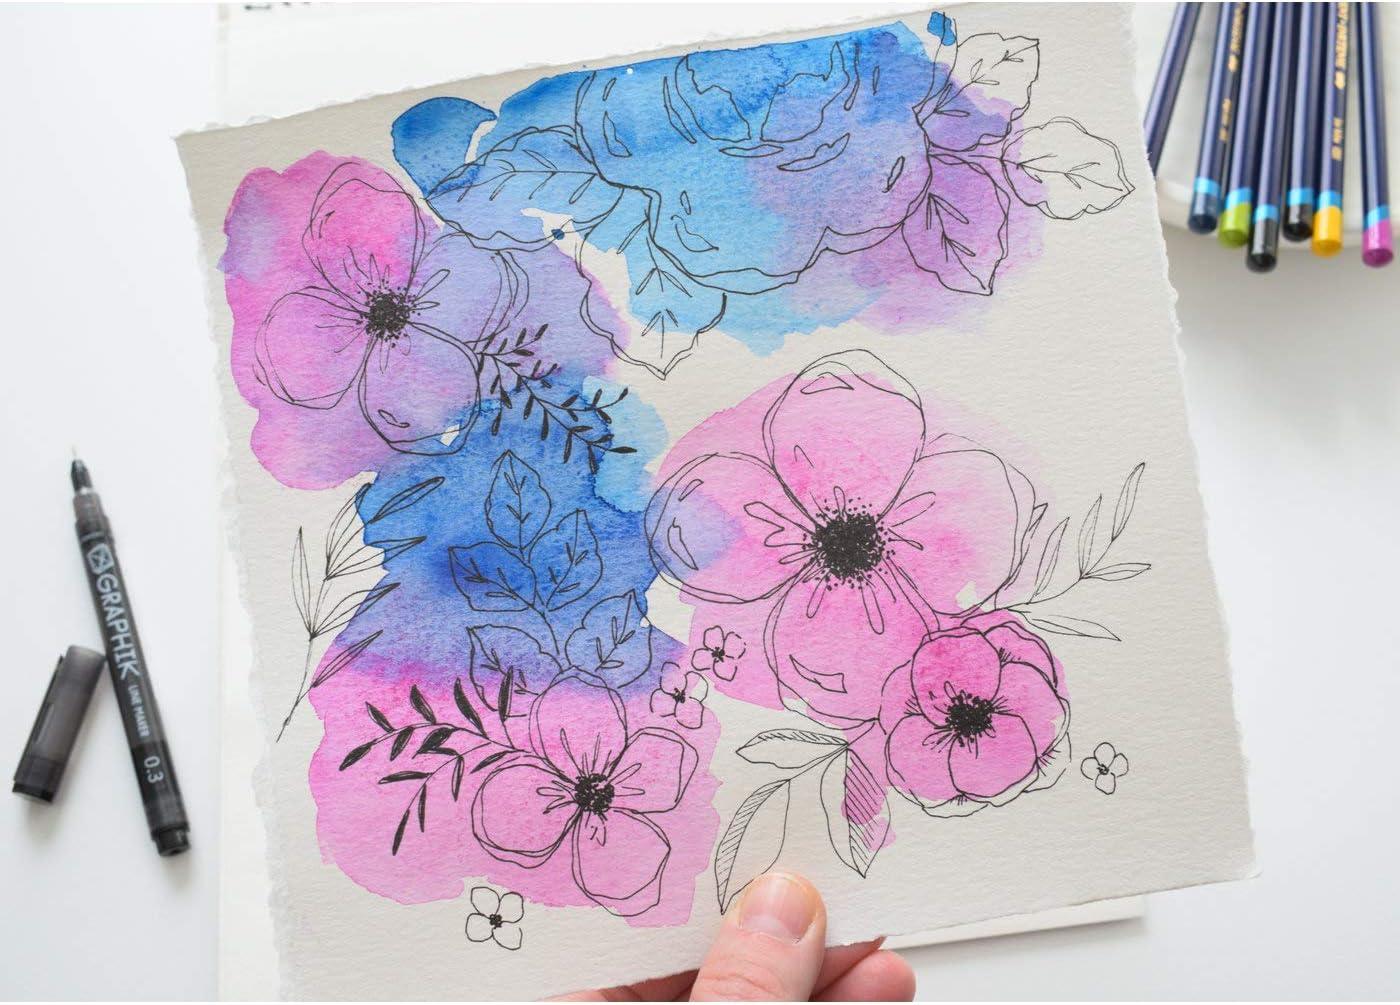 Derwent Hand Lettering Art Set with Inktense Pencils Graphik Pen /& Water Brush